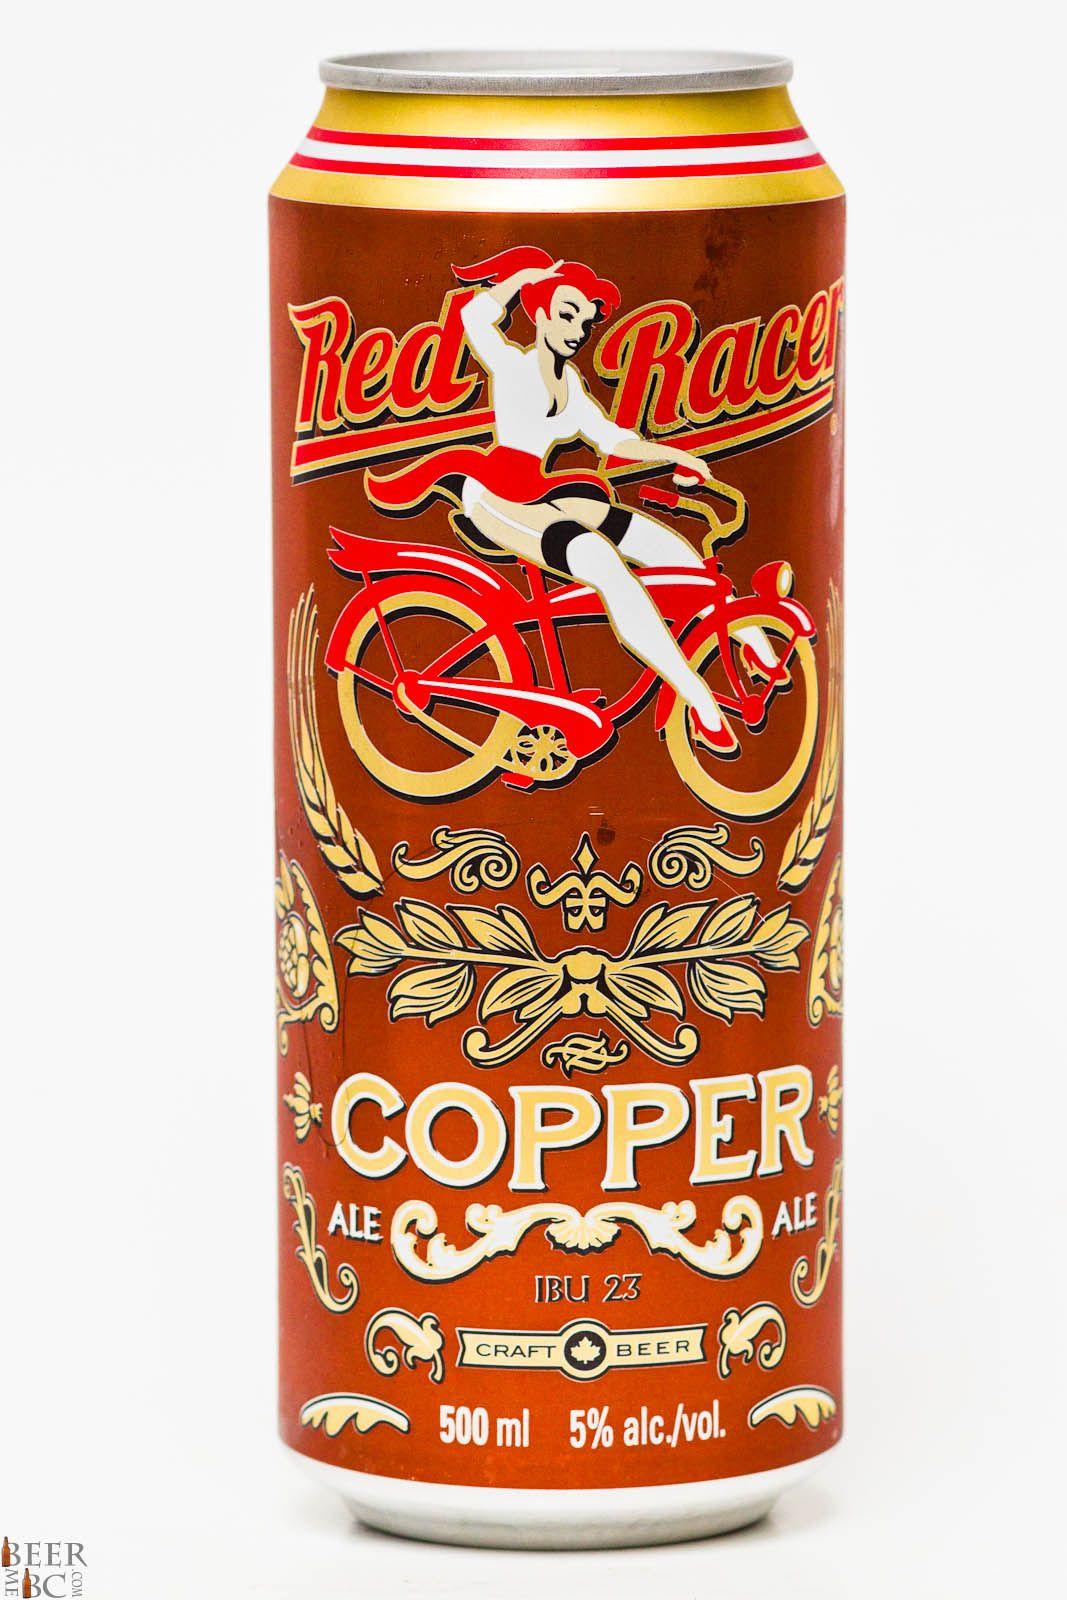 Red Racer Beer Copper Ale Craft Beer Breweries Craft Beer Beer